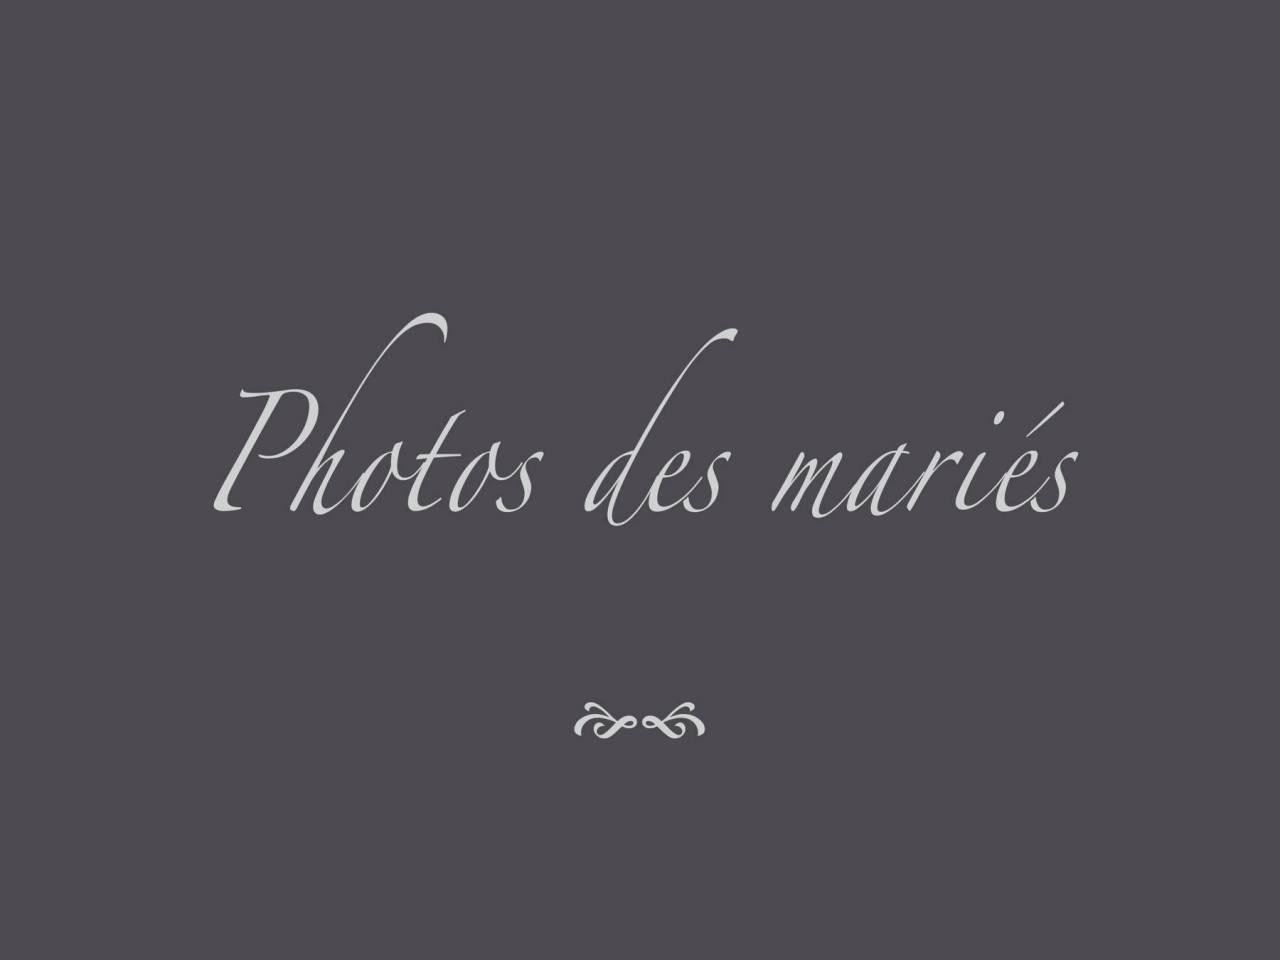 maries_01